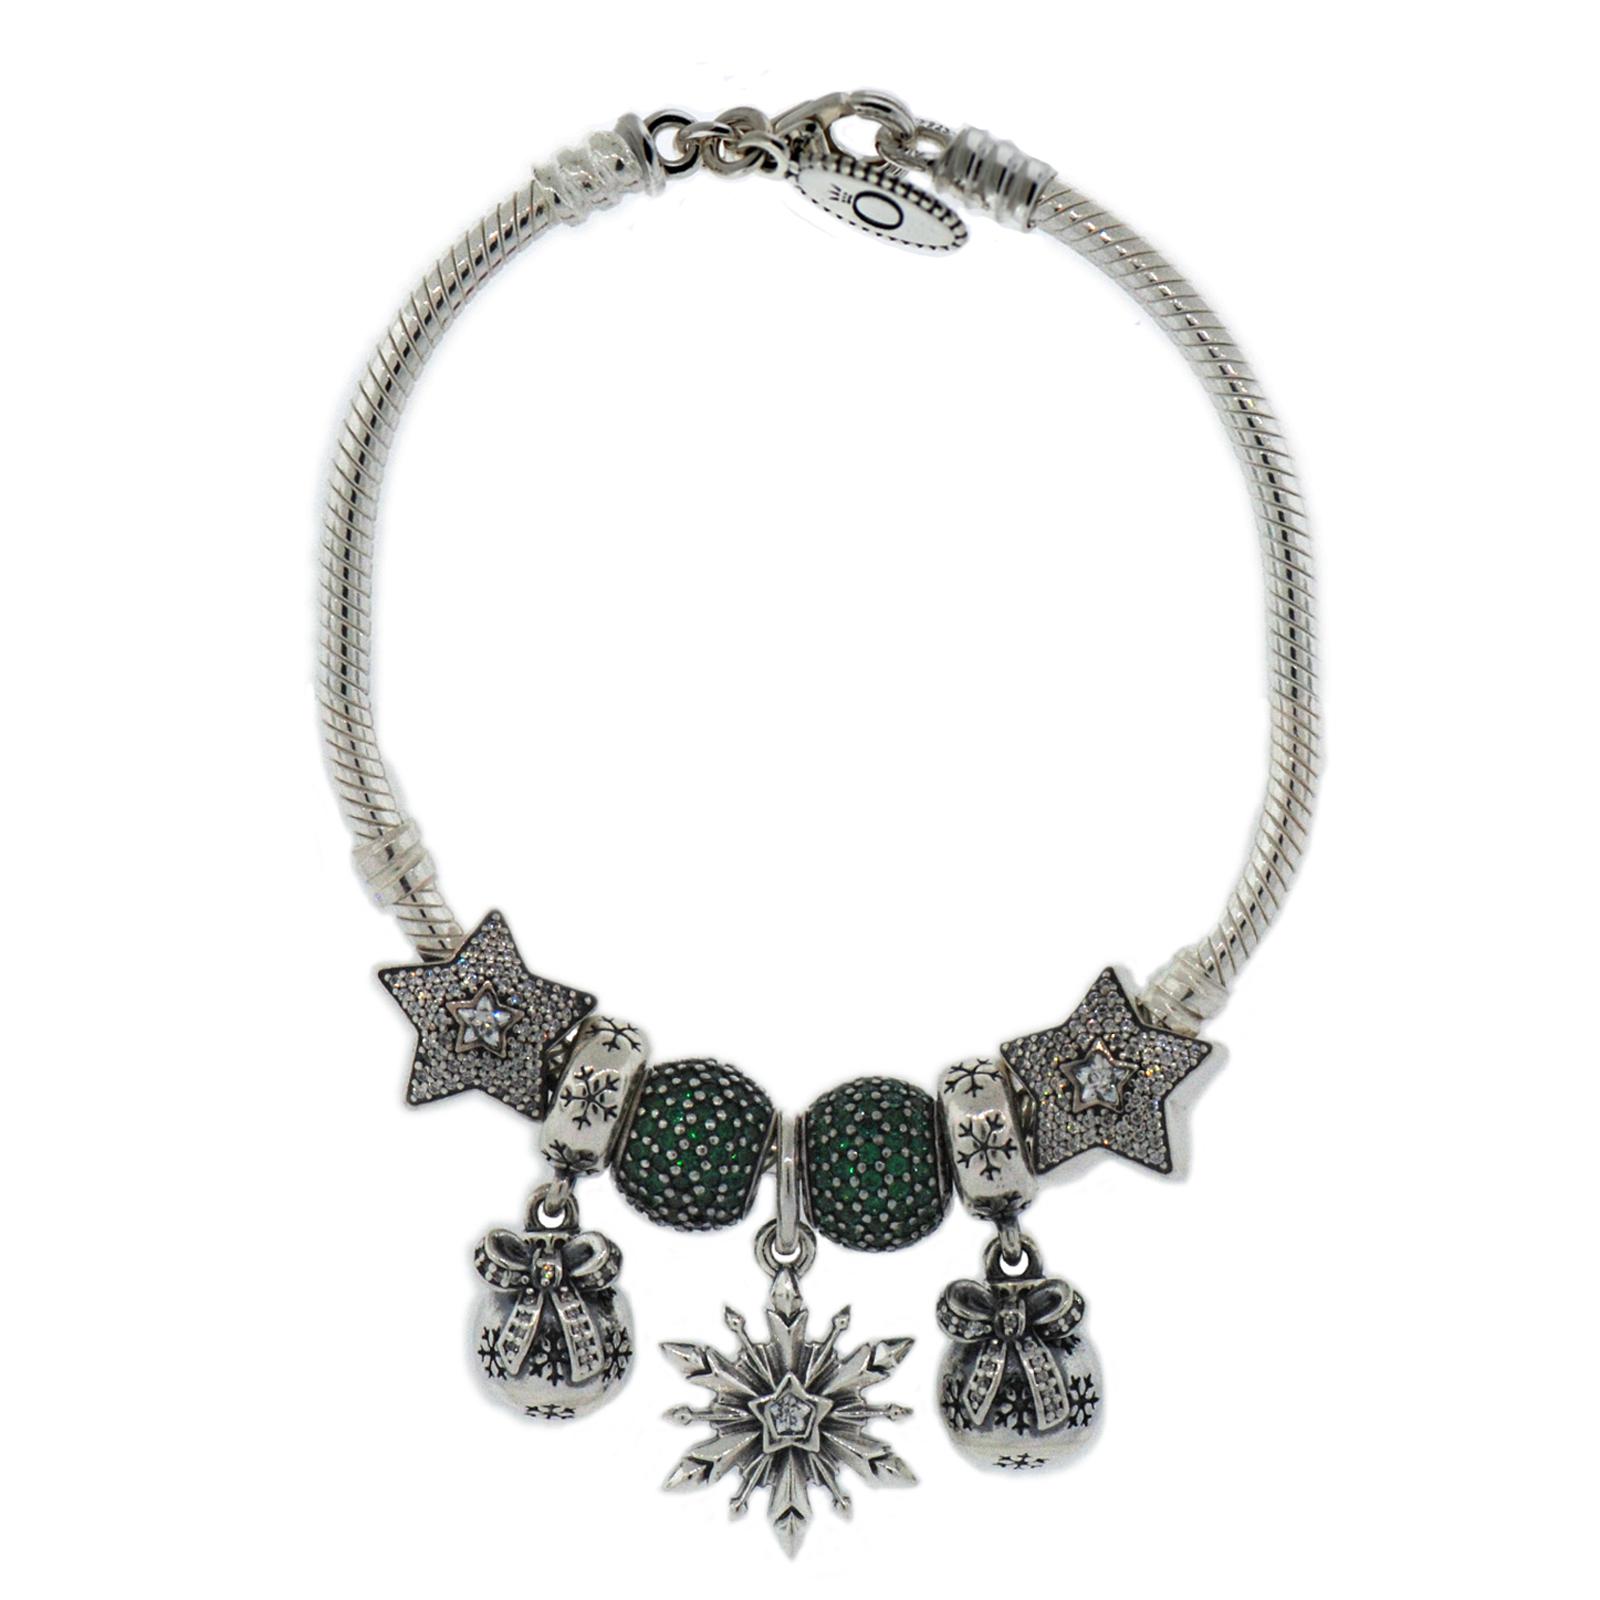 Pandora Christmas Gift Set Bracelet Christmas Gifts And Decorations EBay